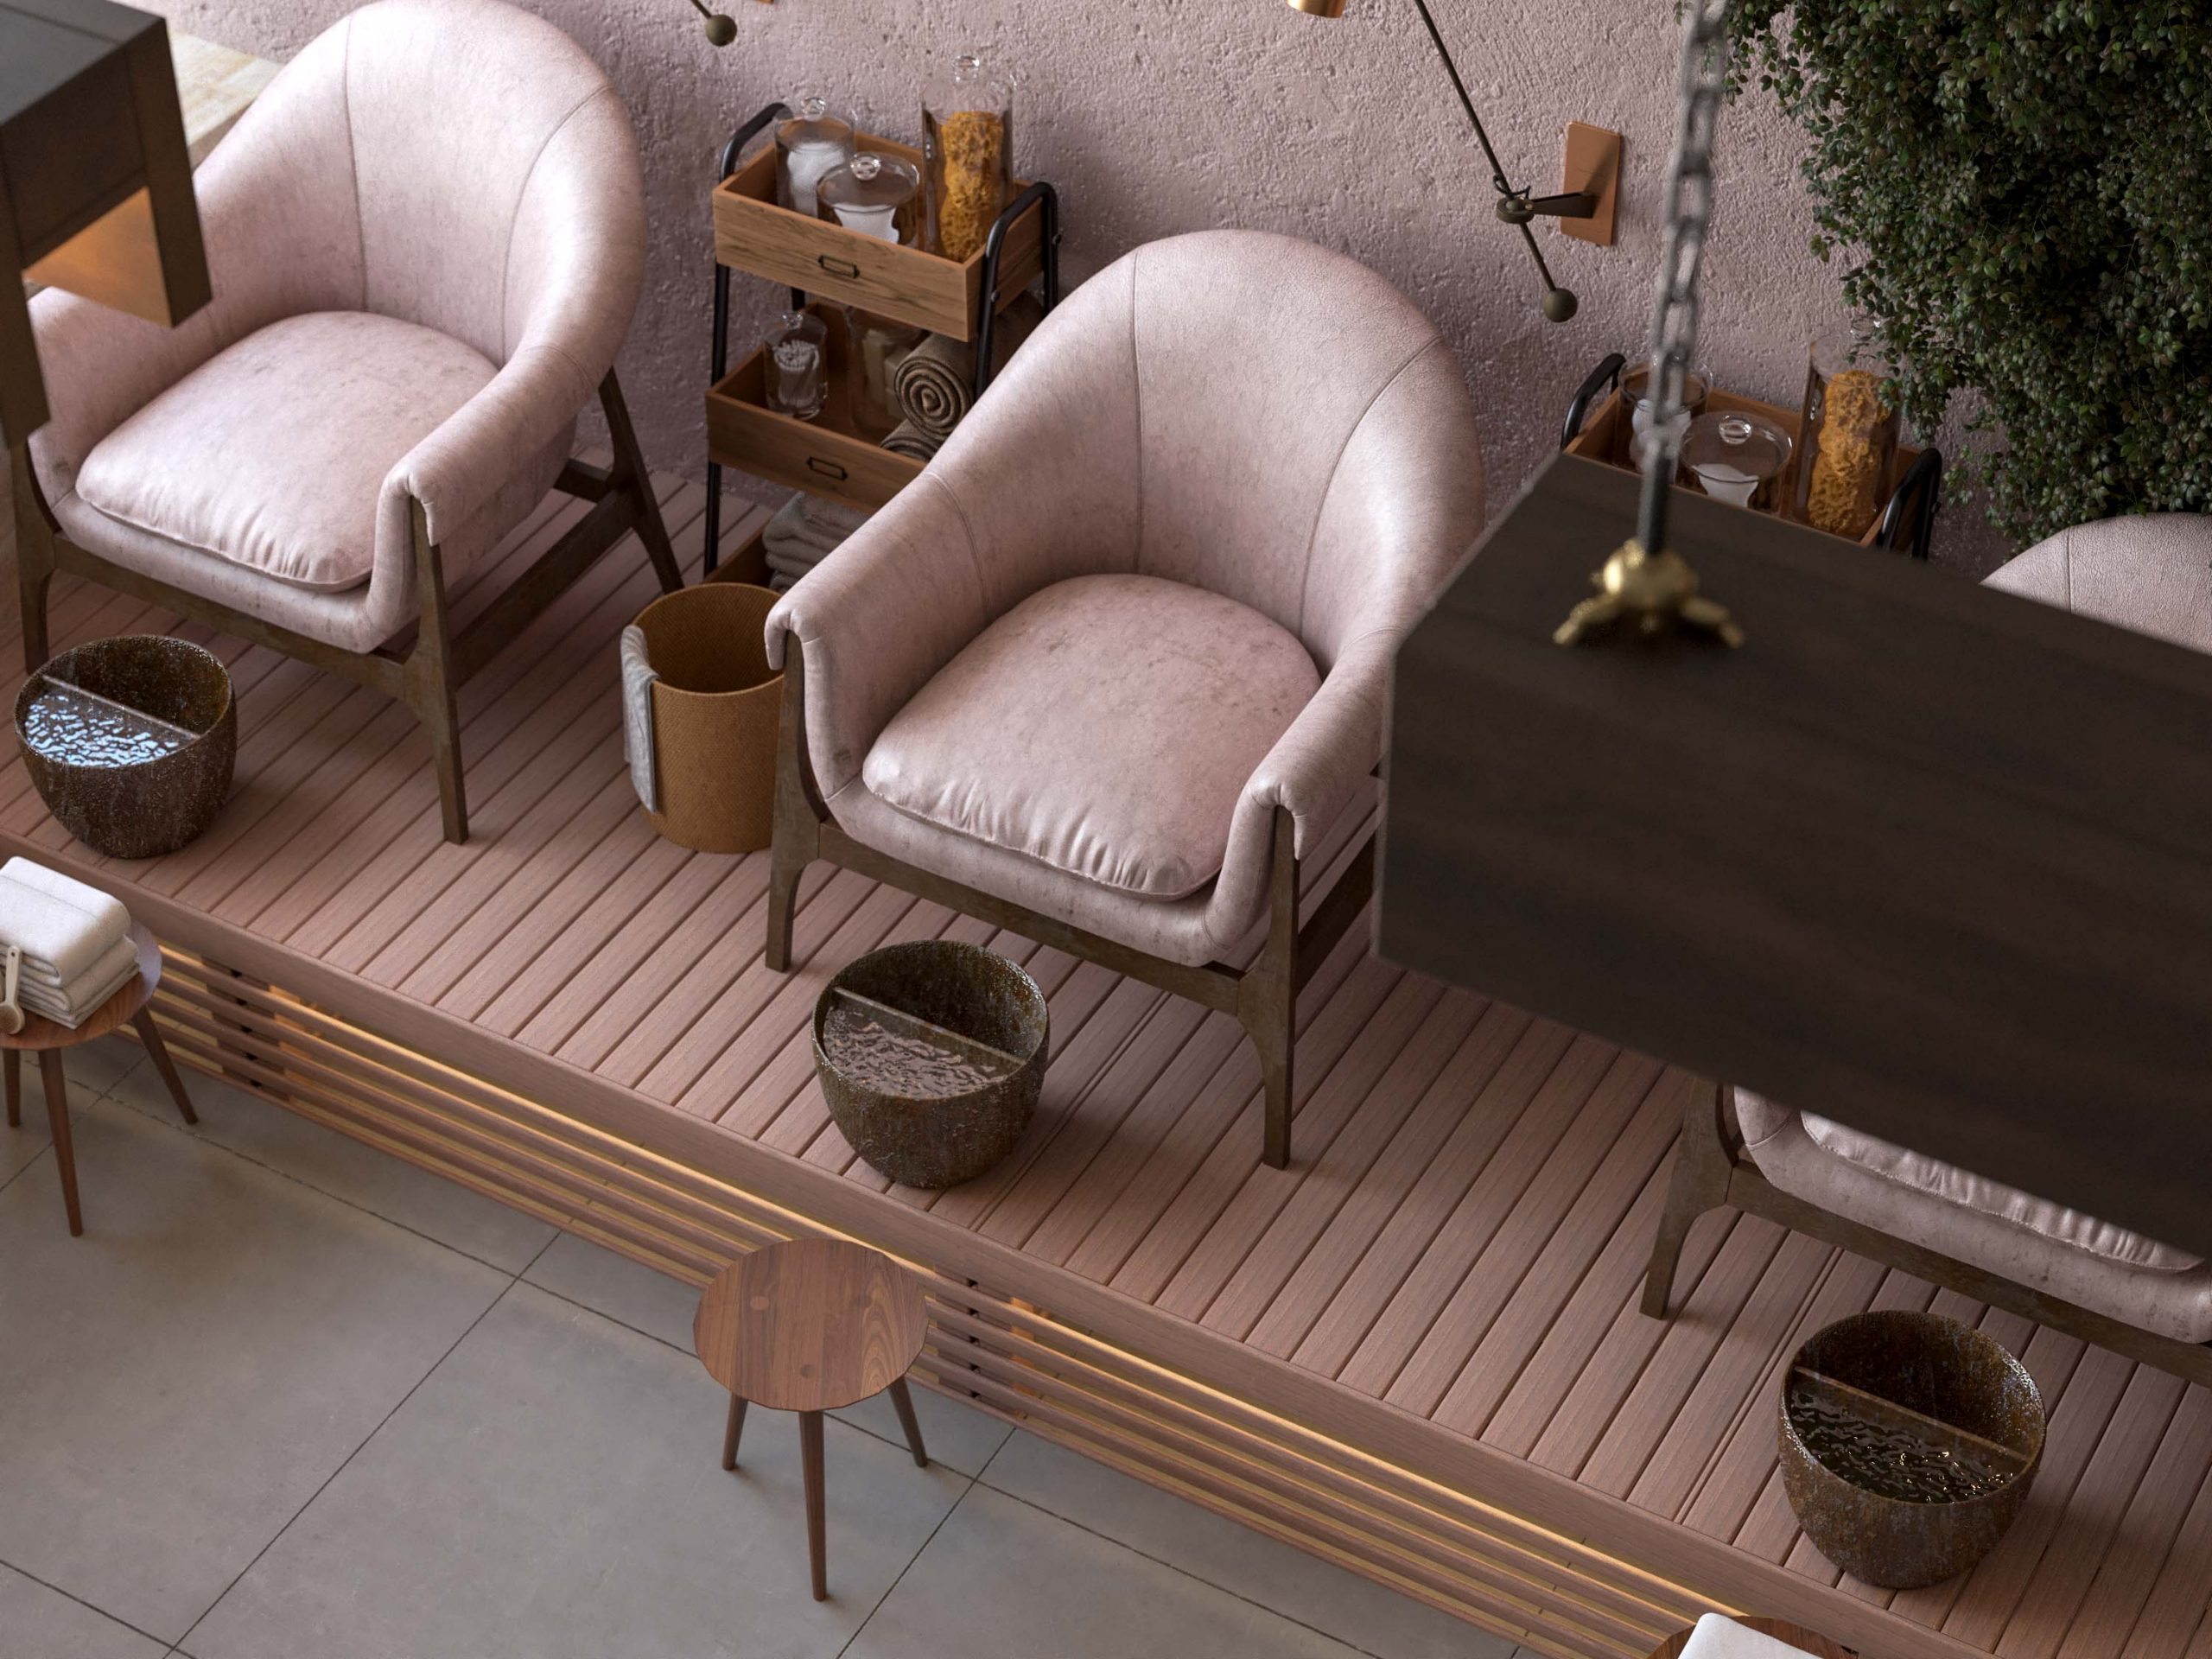 top view - ocean spa design - wood - nails